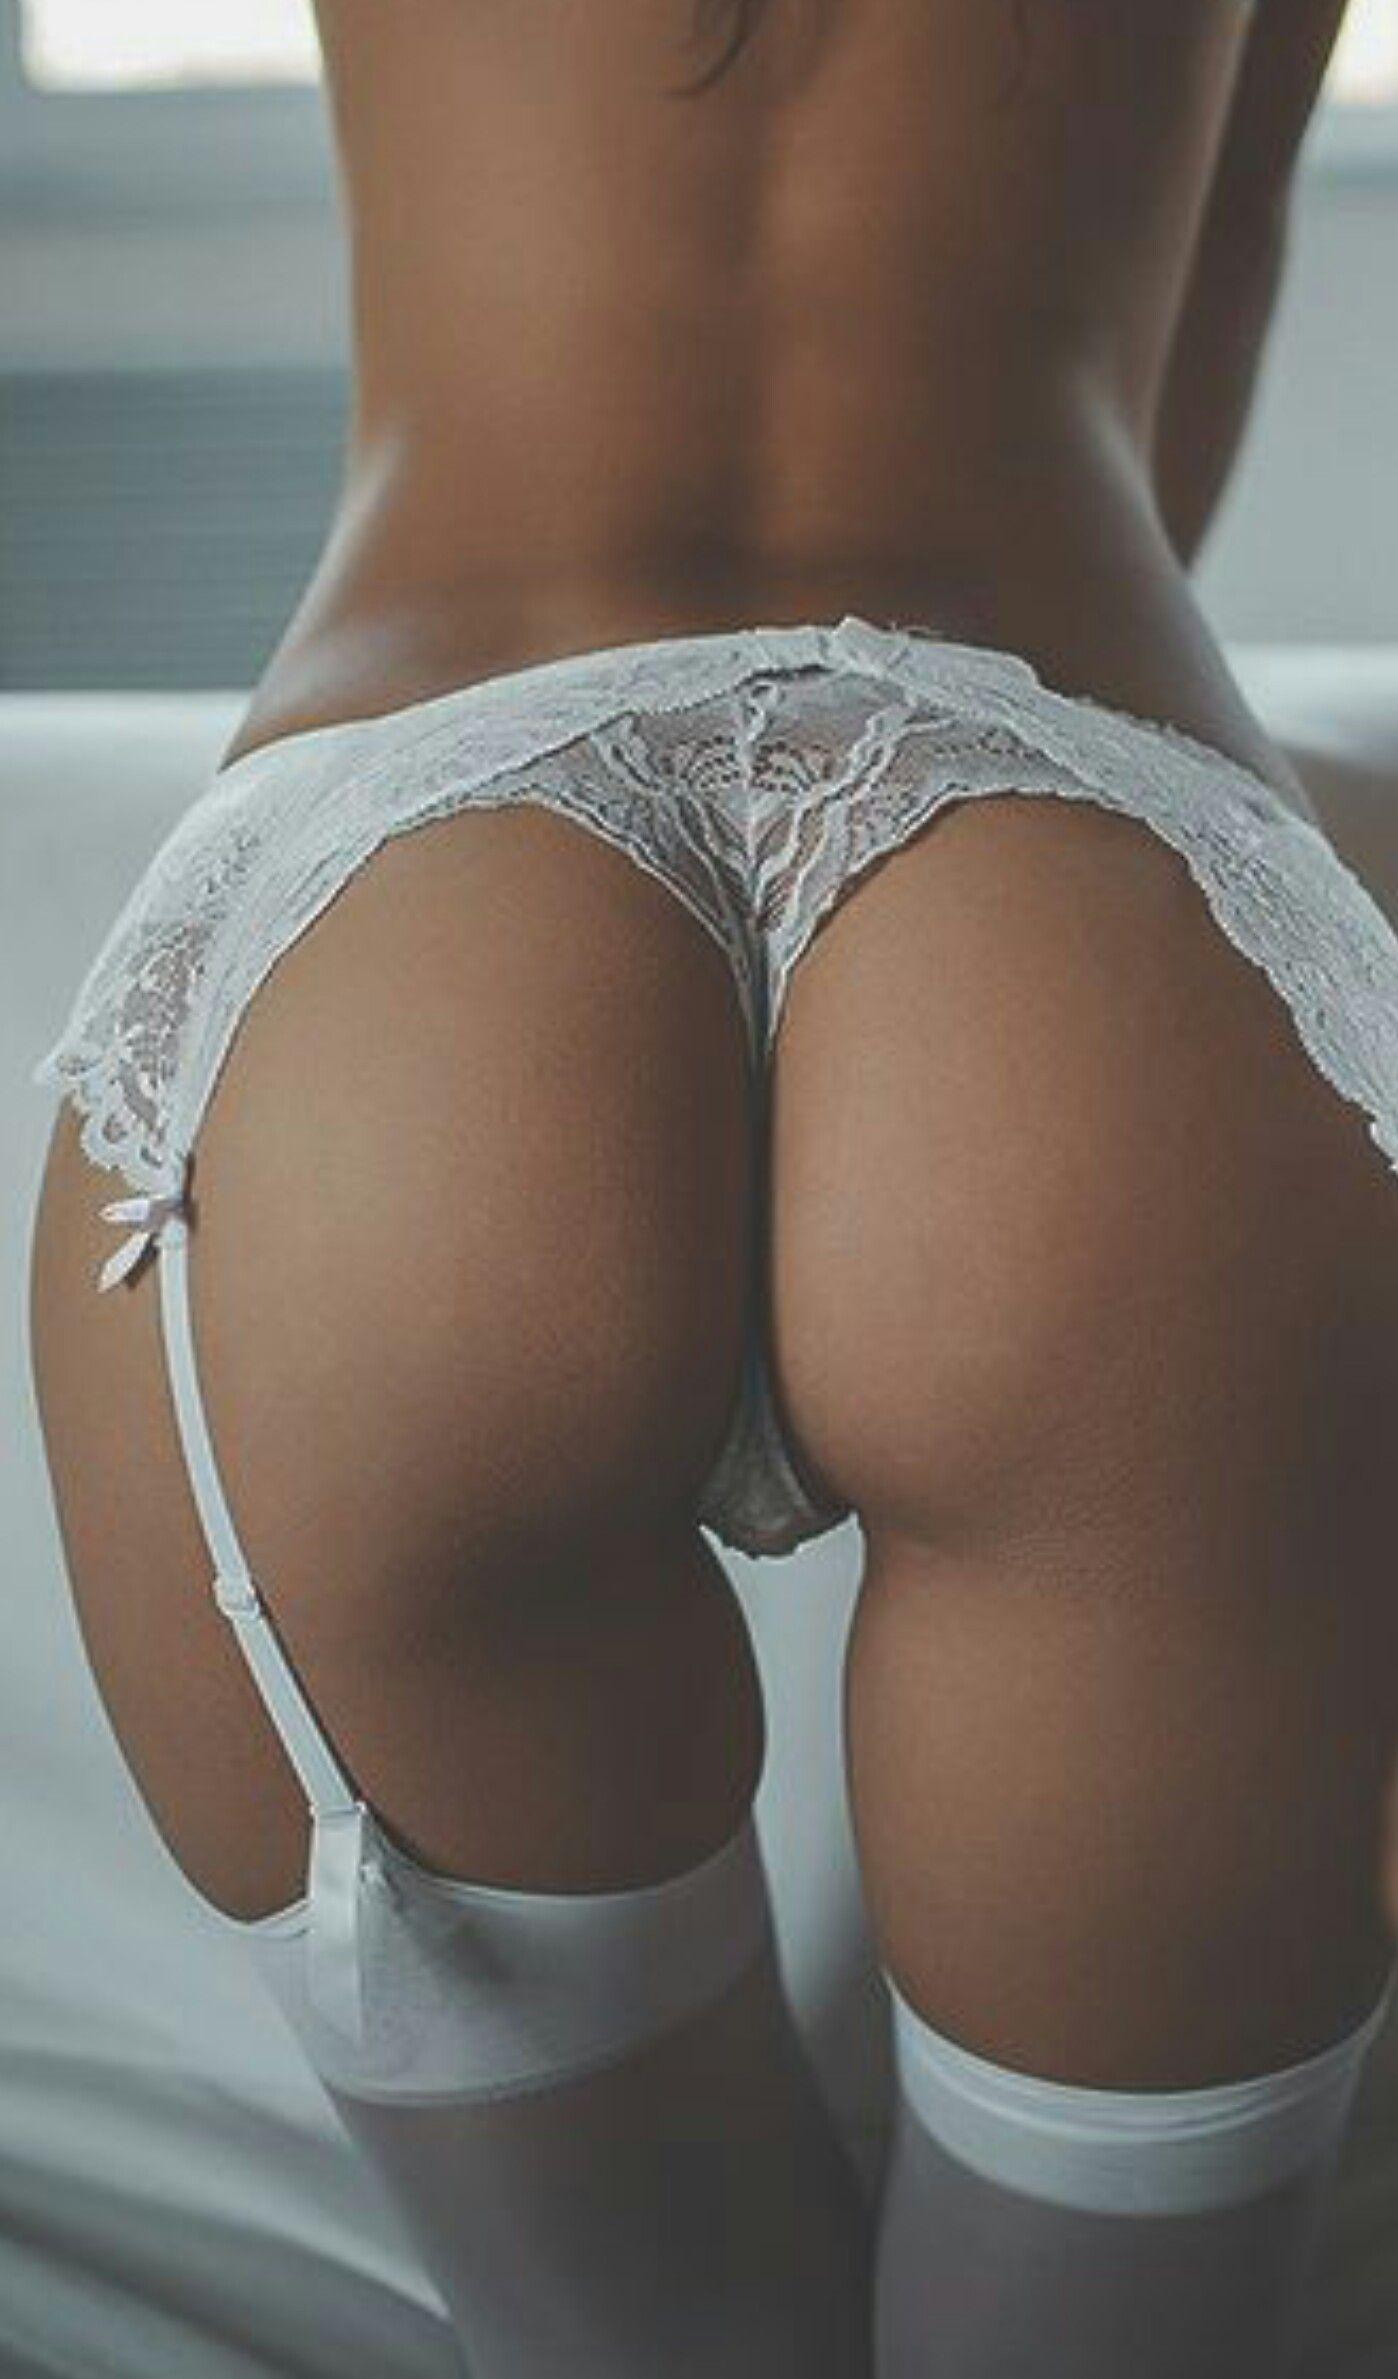 Girls with huge dildos tumblr-6784